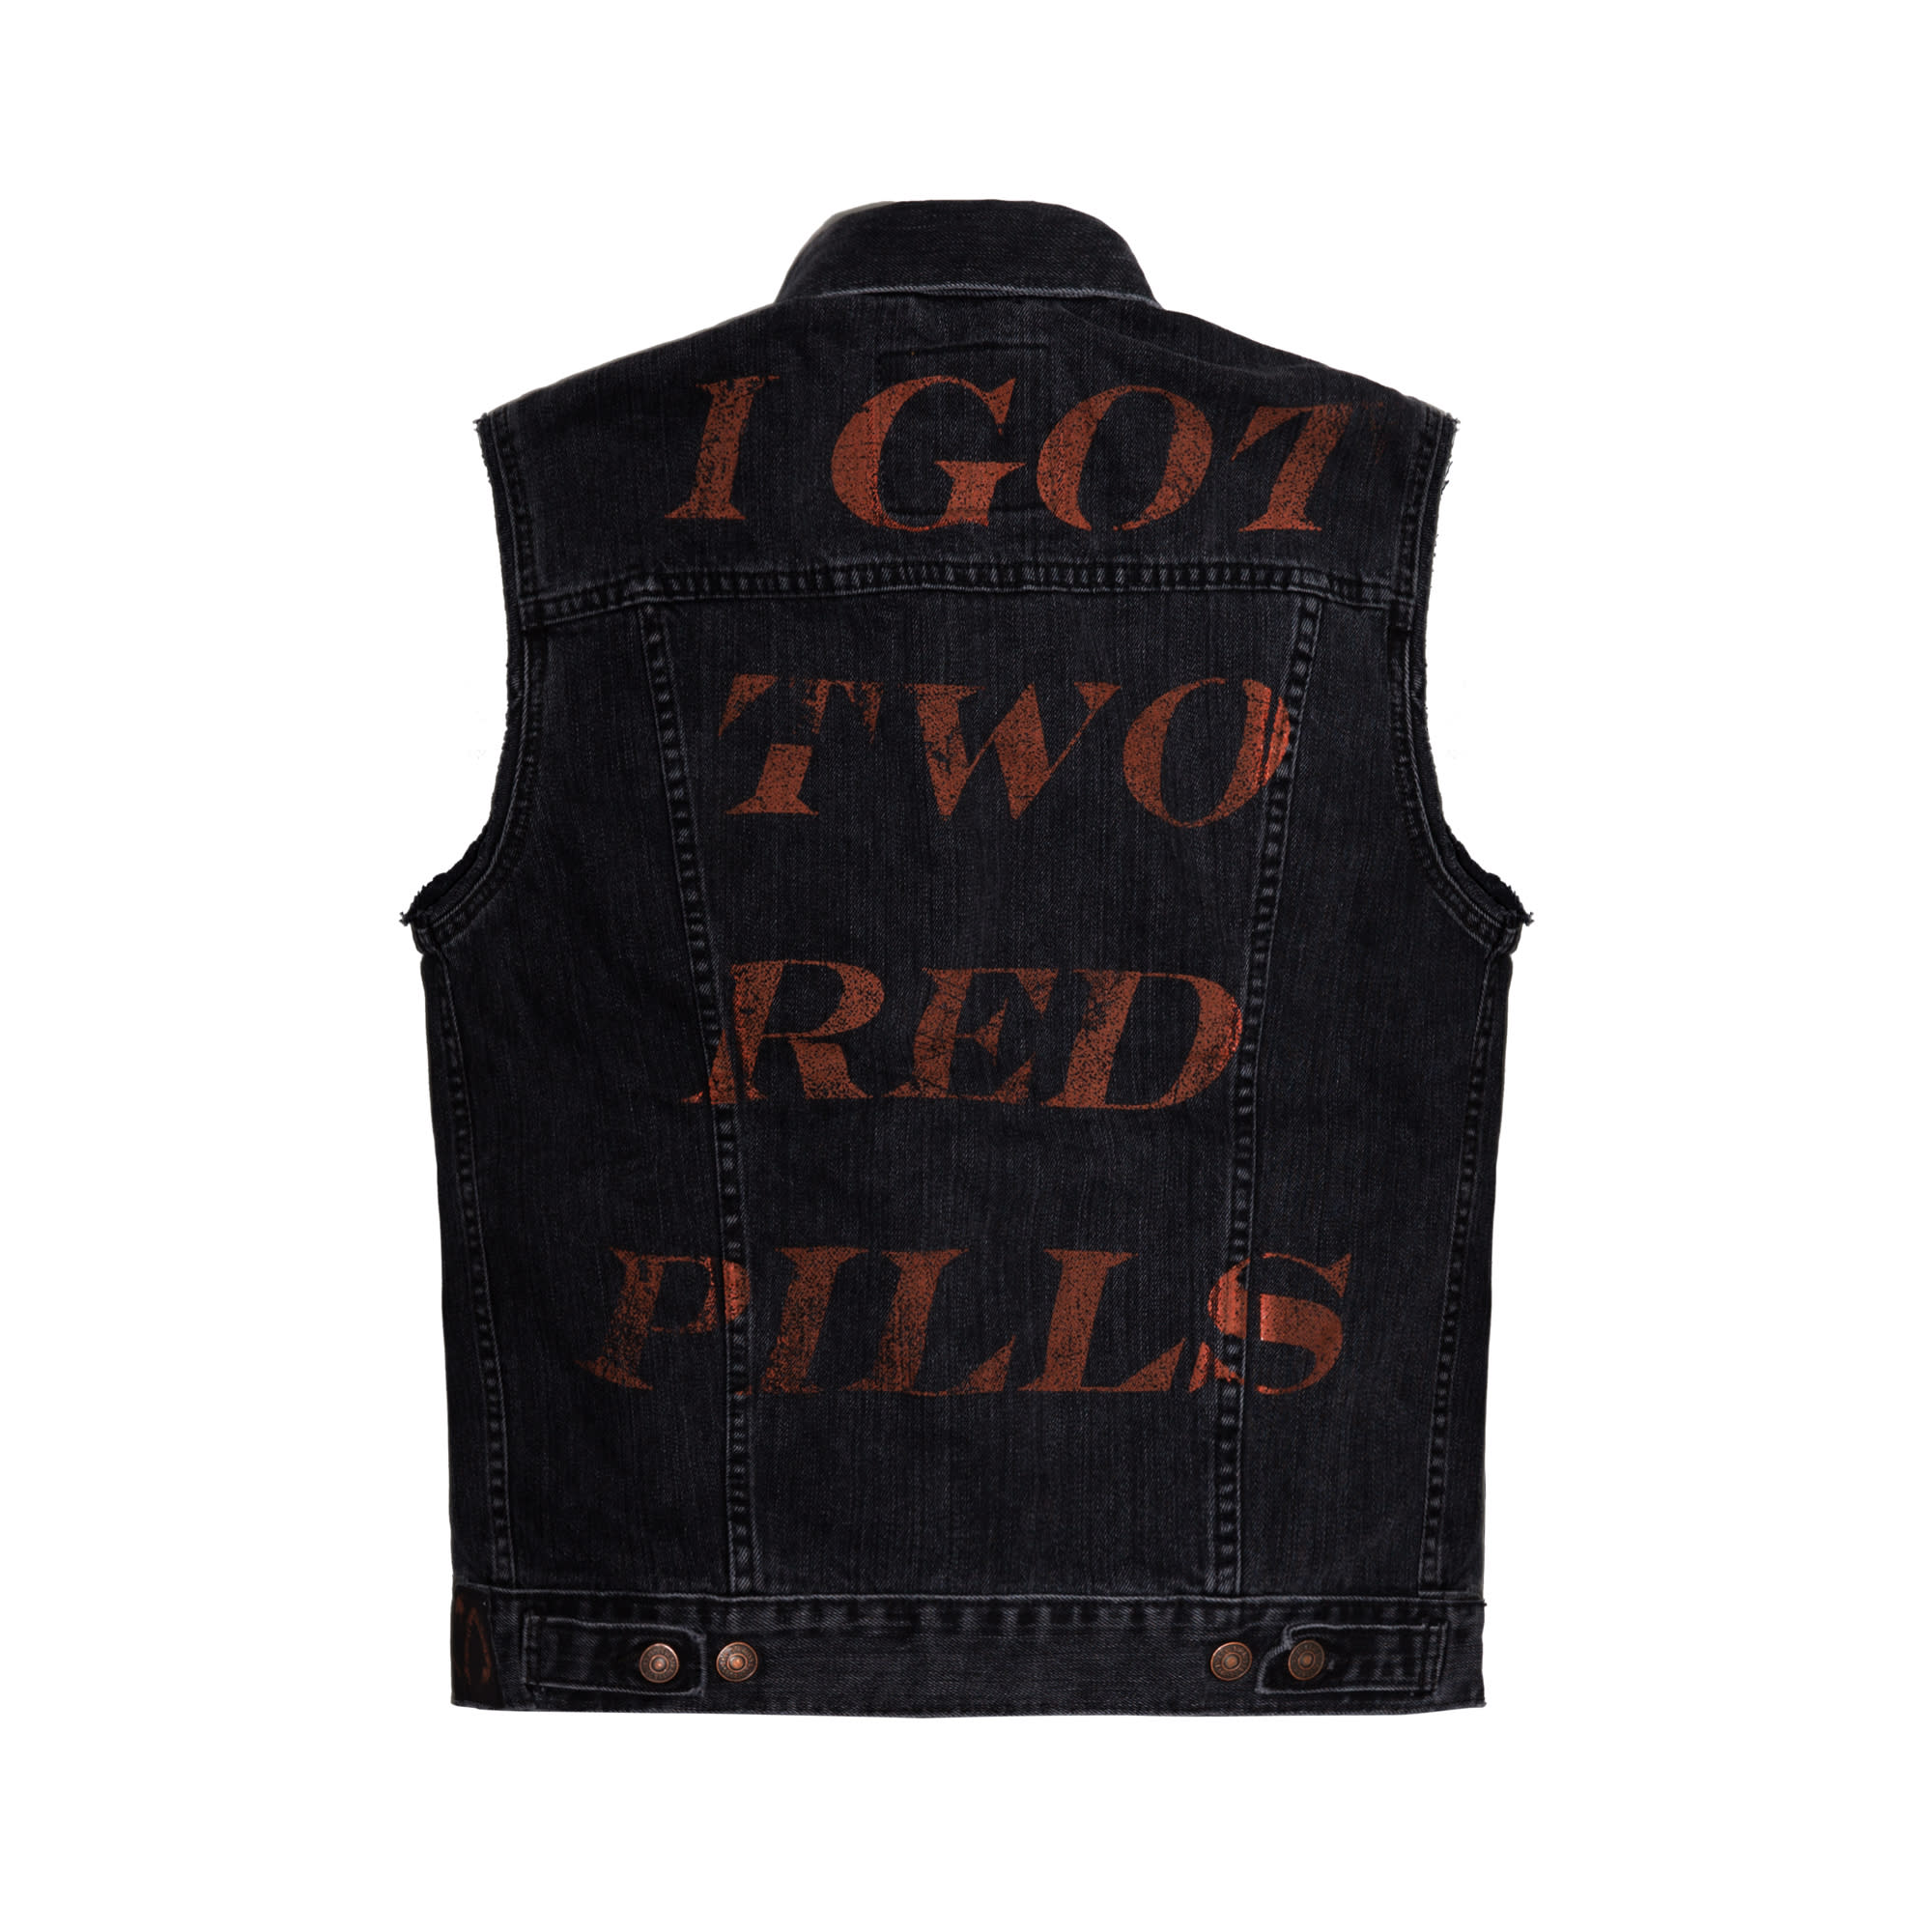 "The Weeknd's 'My Dear Melancholy' ""Privilege"" vest back."